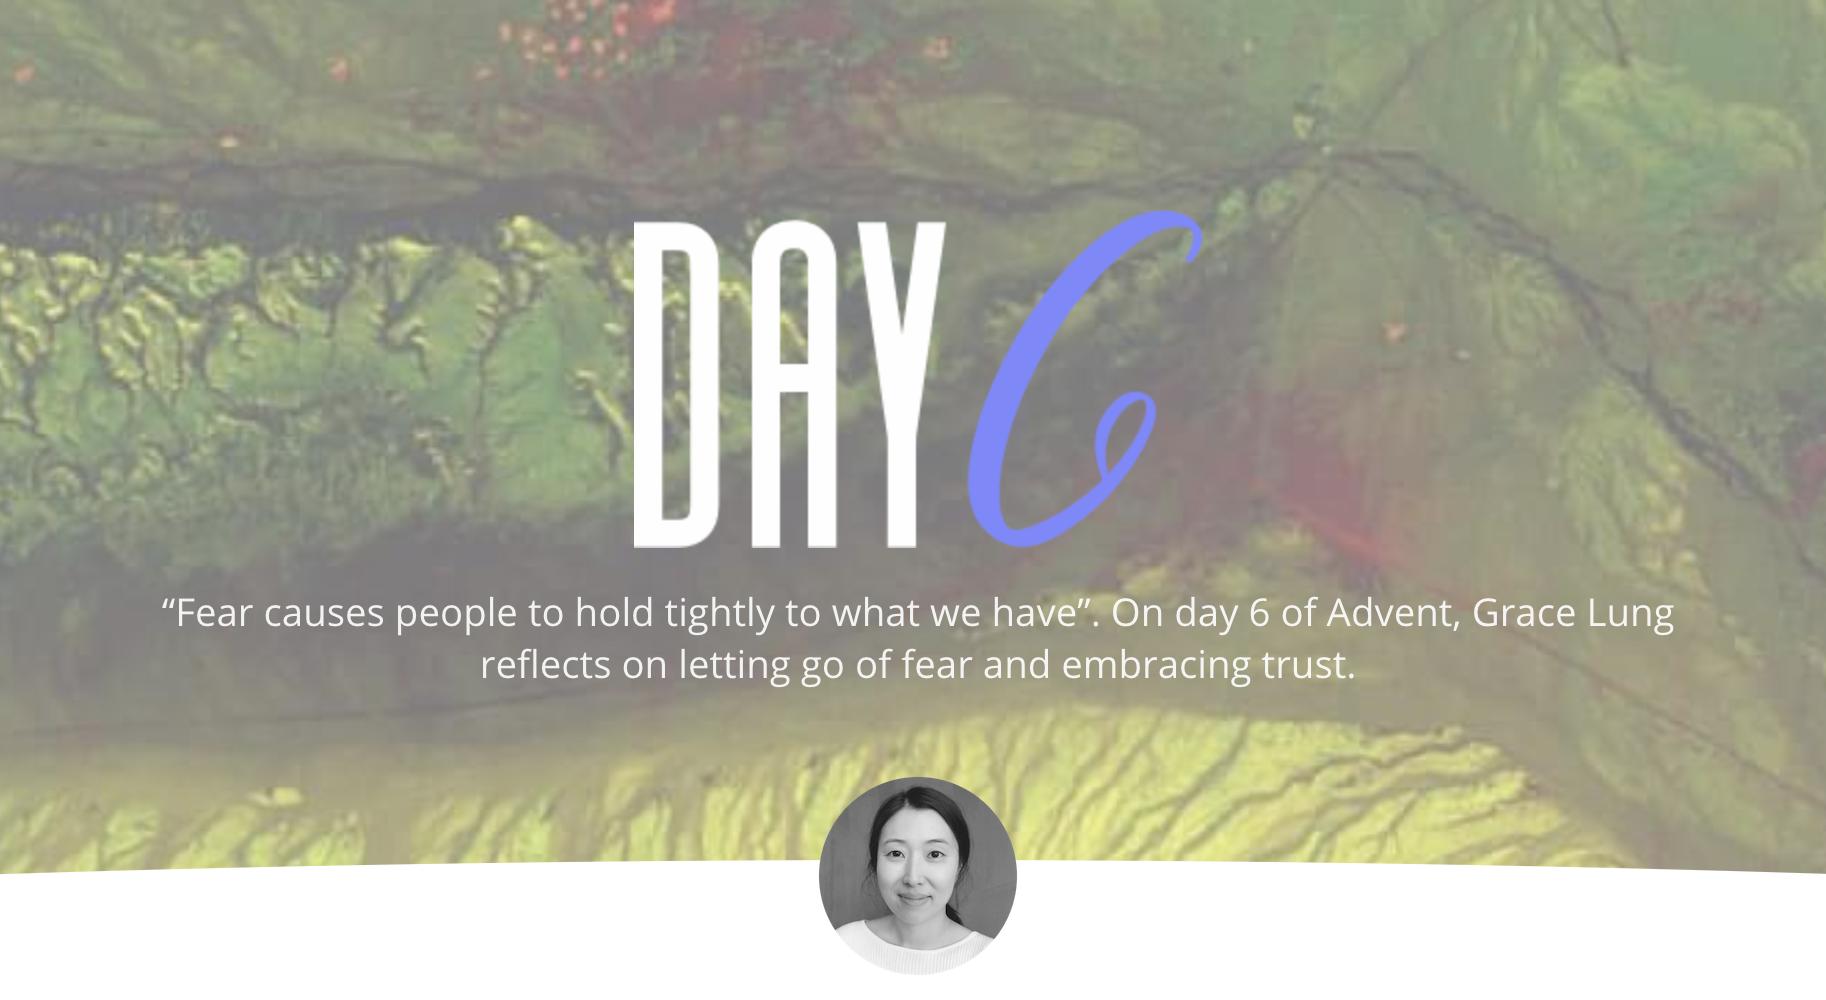 A Universal Problem      Common Grace's Advent Series   6 December, 2018  Author: Grace Lung, 2019 ADM Summer Fellow